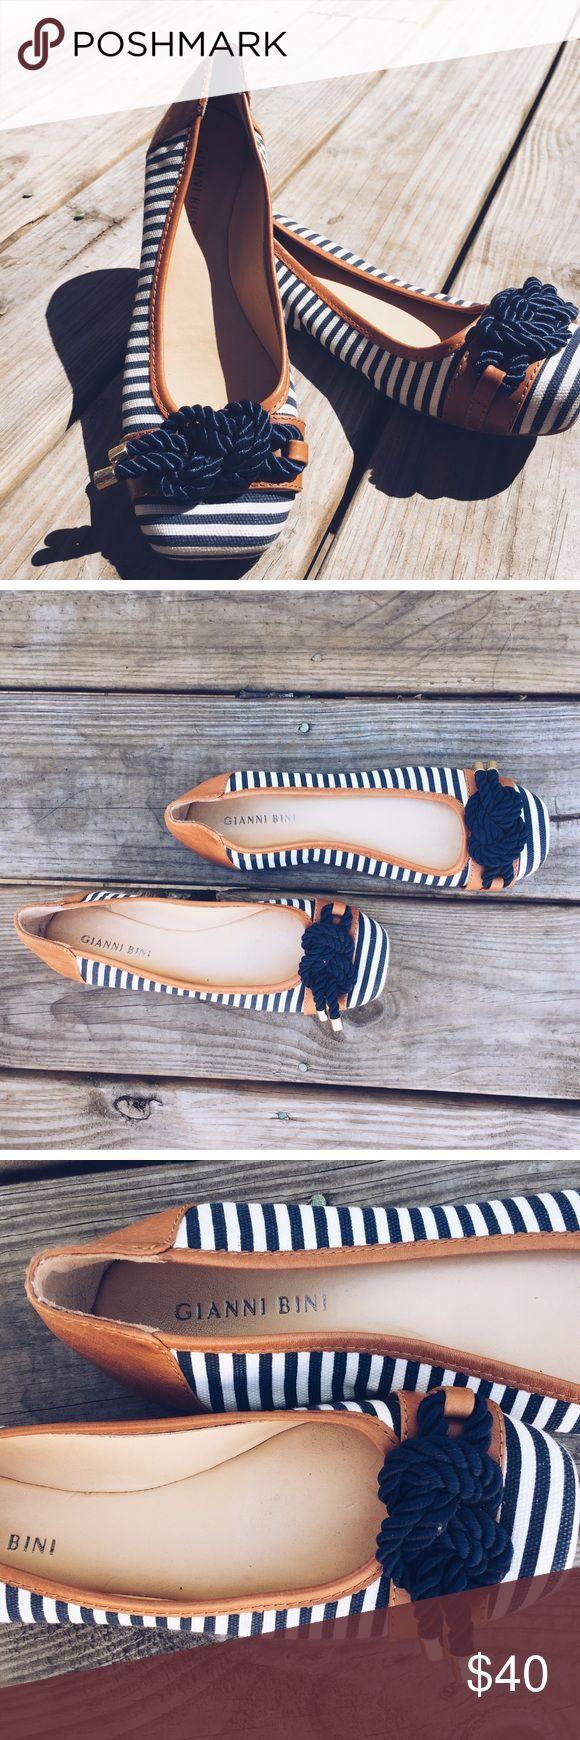 Gianni Bini Flats Nautical Gianni Bini flats. $35.00 :: Final Price. Gianni Bini Shoes Flats & Loafers